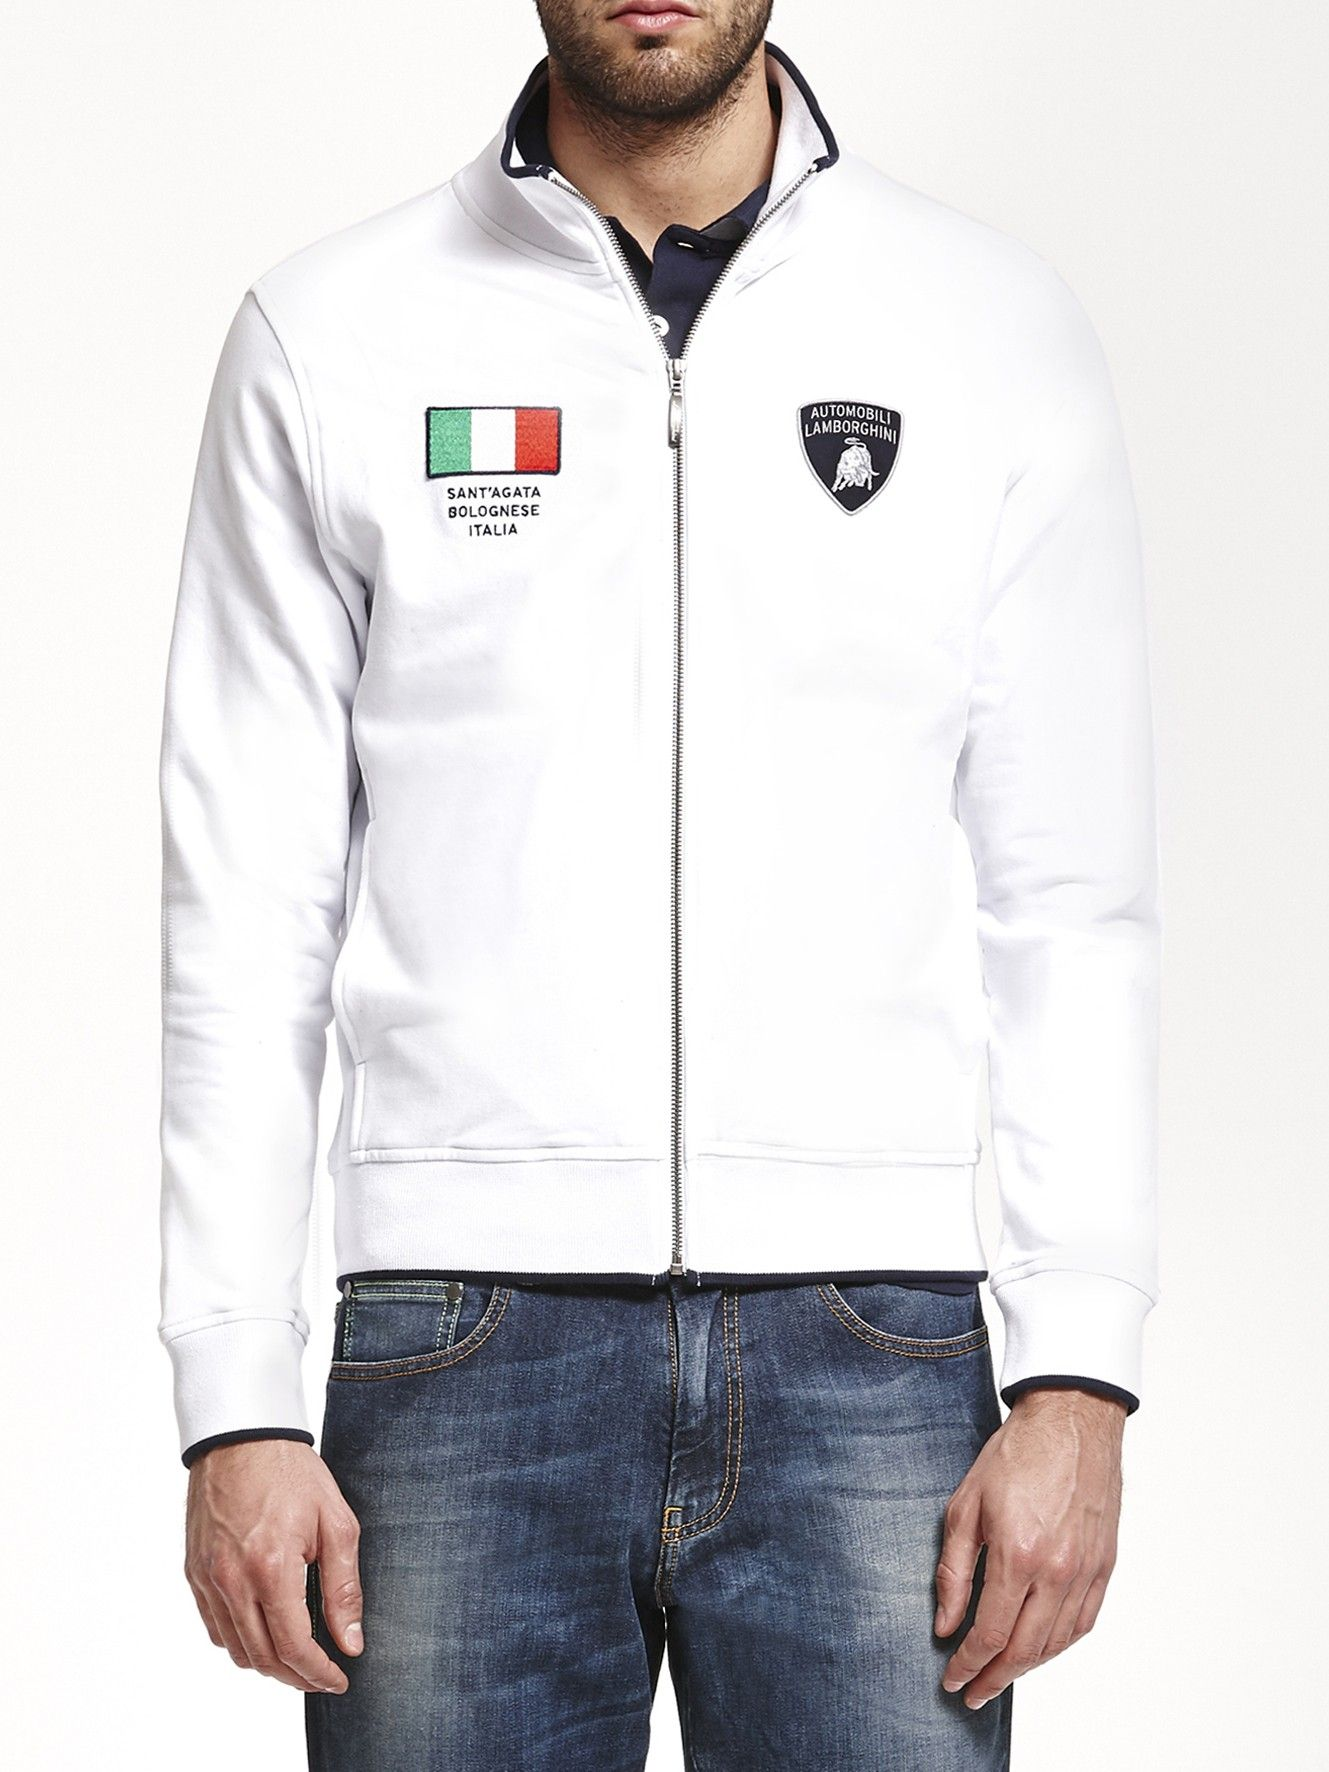 8641dc79 Italian Flag sweatshirt optic white Collezione Automobili Lamborghini  Lamborghini Store: visit Lamborghini Official Online Shop